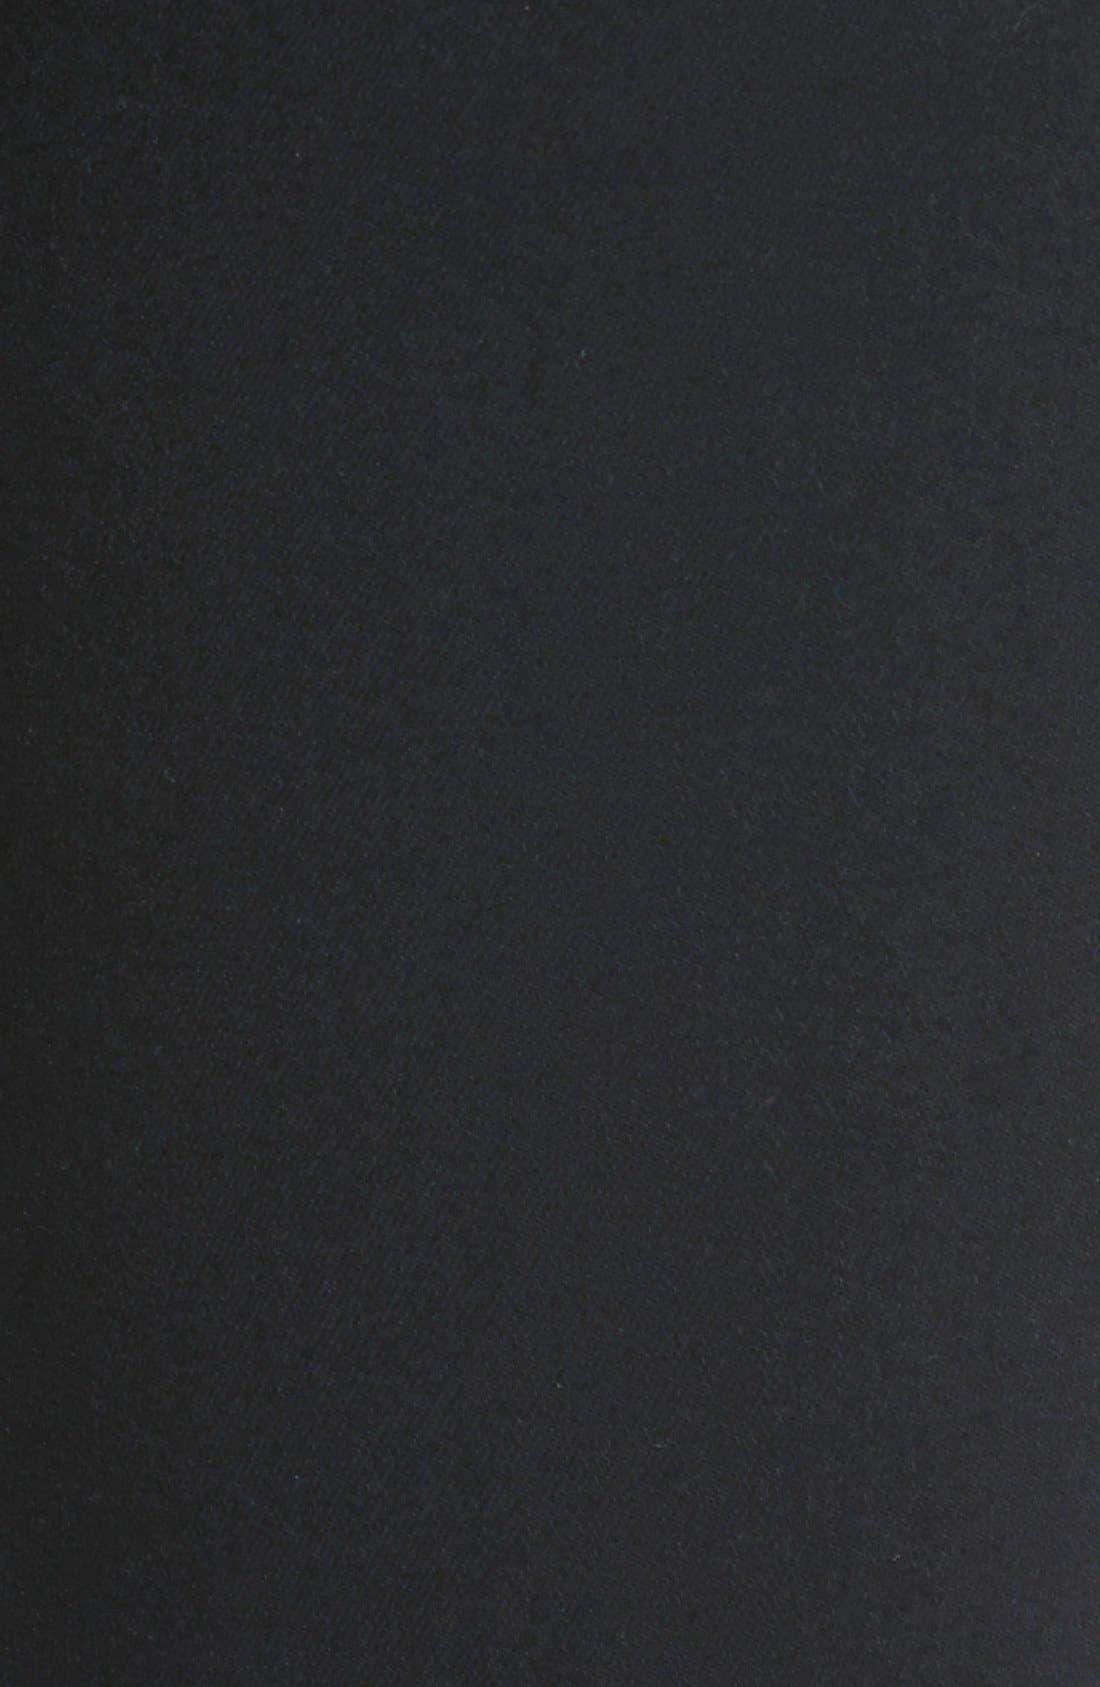 Transcend - Verdugo Ankle Ultra Skinny Jeans,                             Alternate thumbnail 5, color,                             Black Shadow